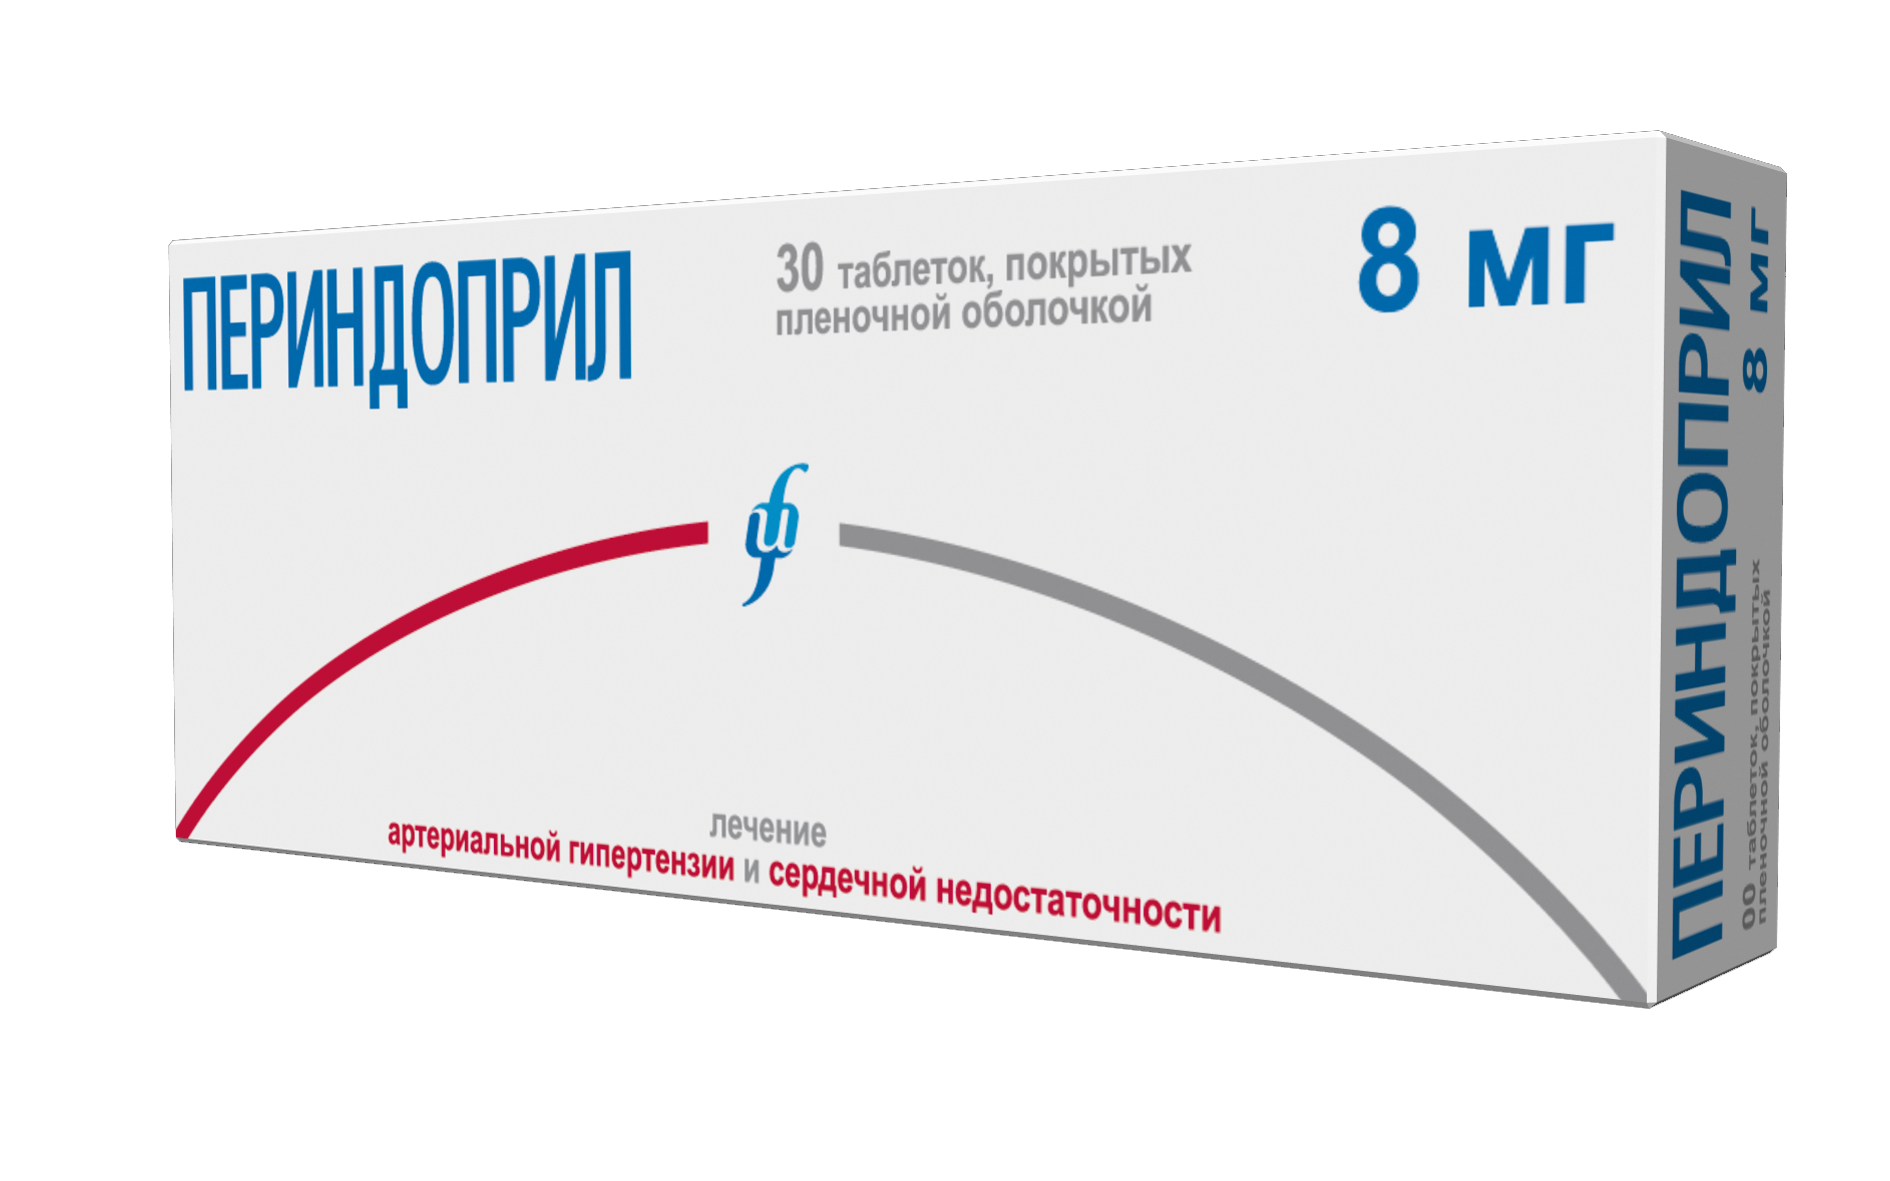 Ко-периндоприл (ko-perindopril)